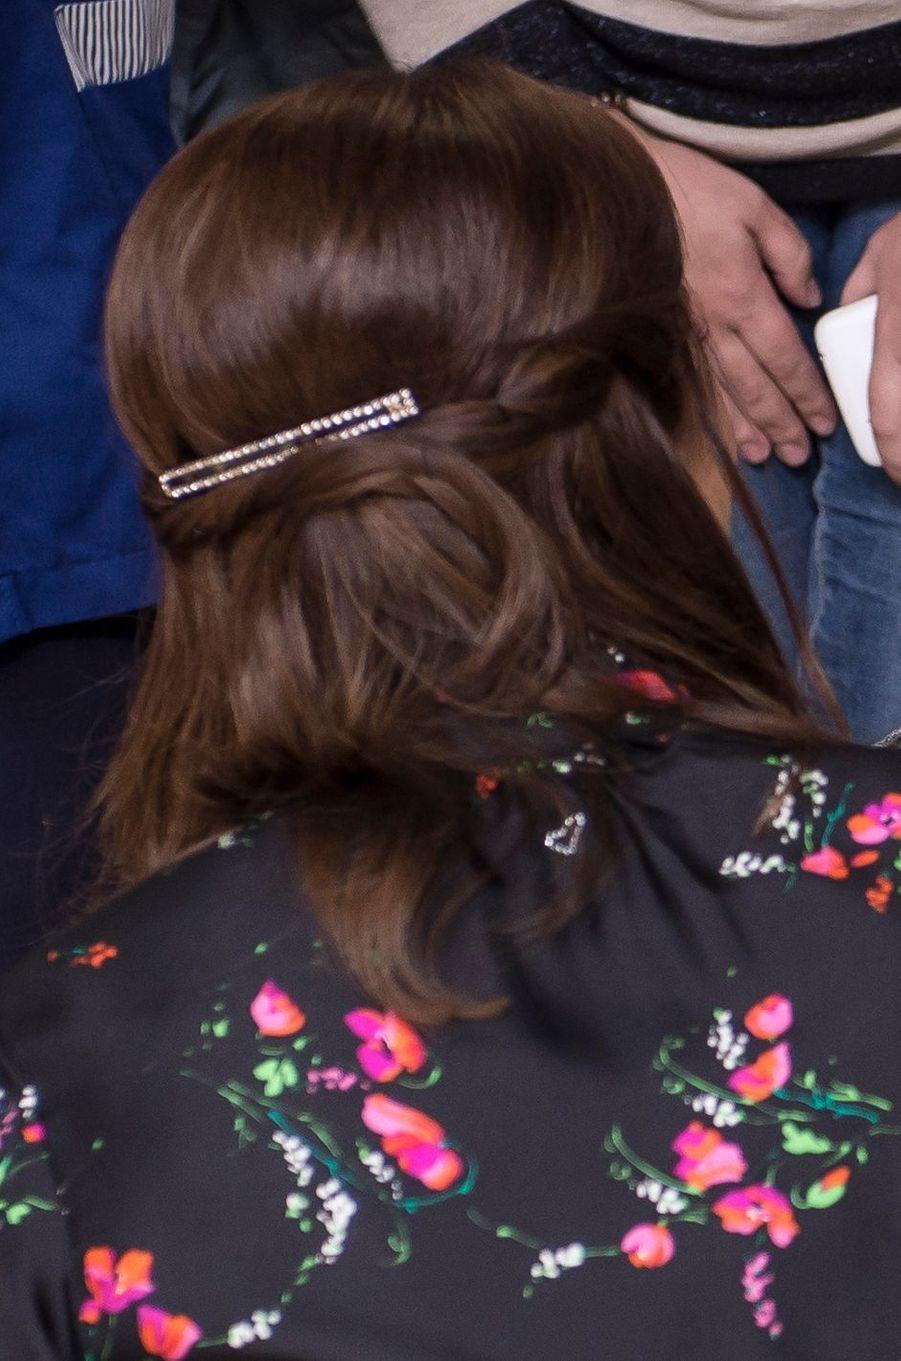 La coiffure de la princesse Mary de Danemark à Rome, le 8 novembre 2018